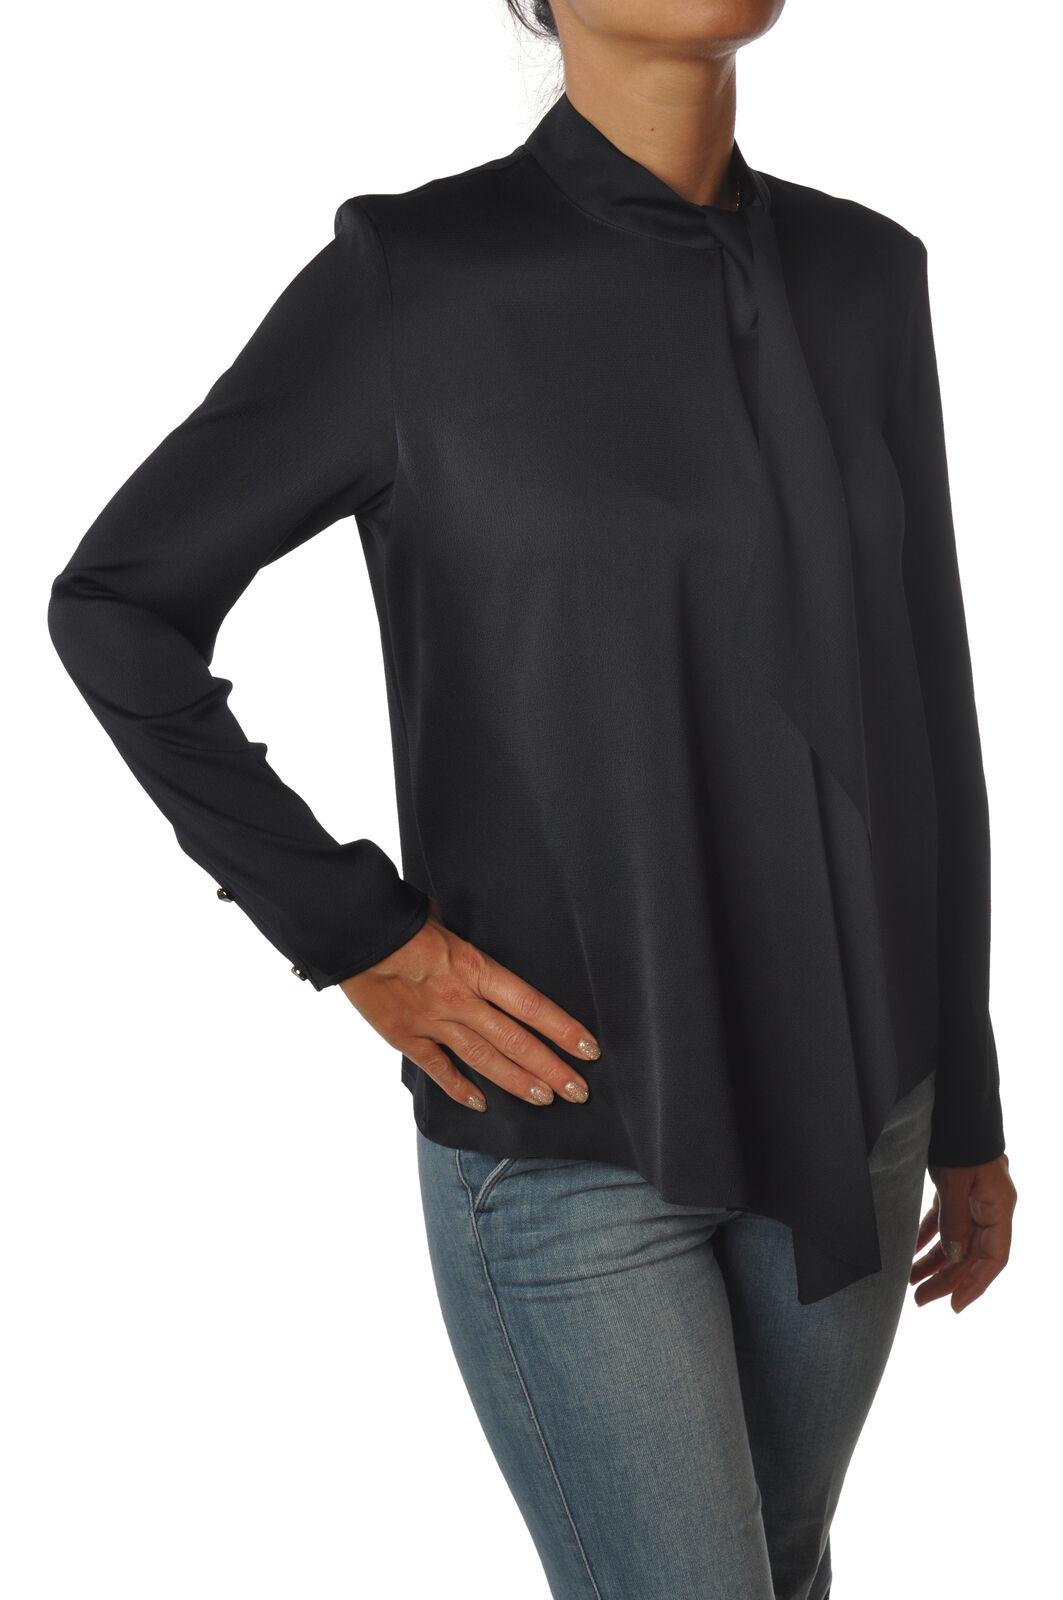 Rame - Shirts-Blouses - Woman - bluee - 5516209C192807